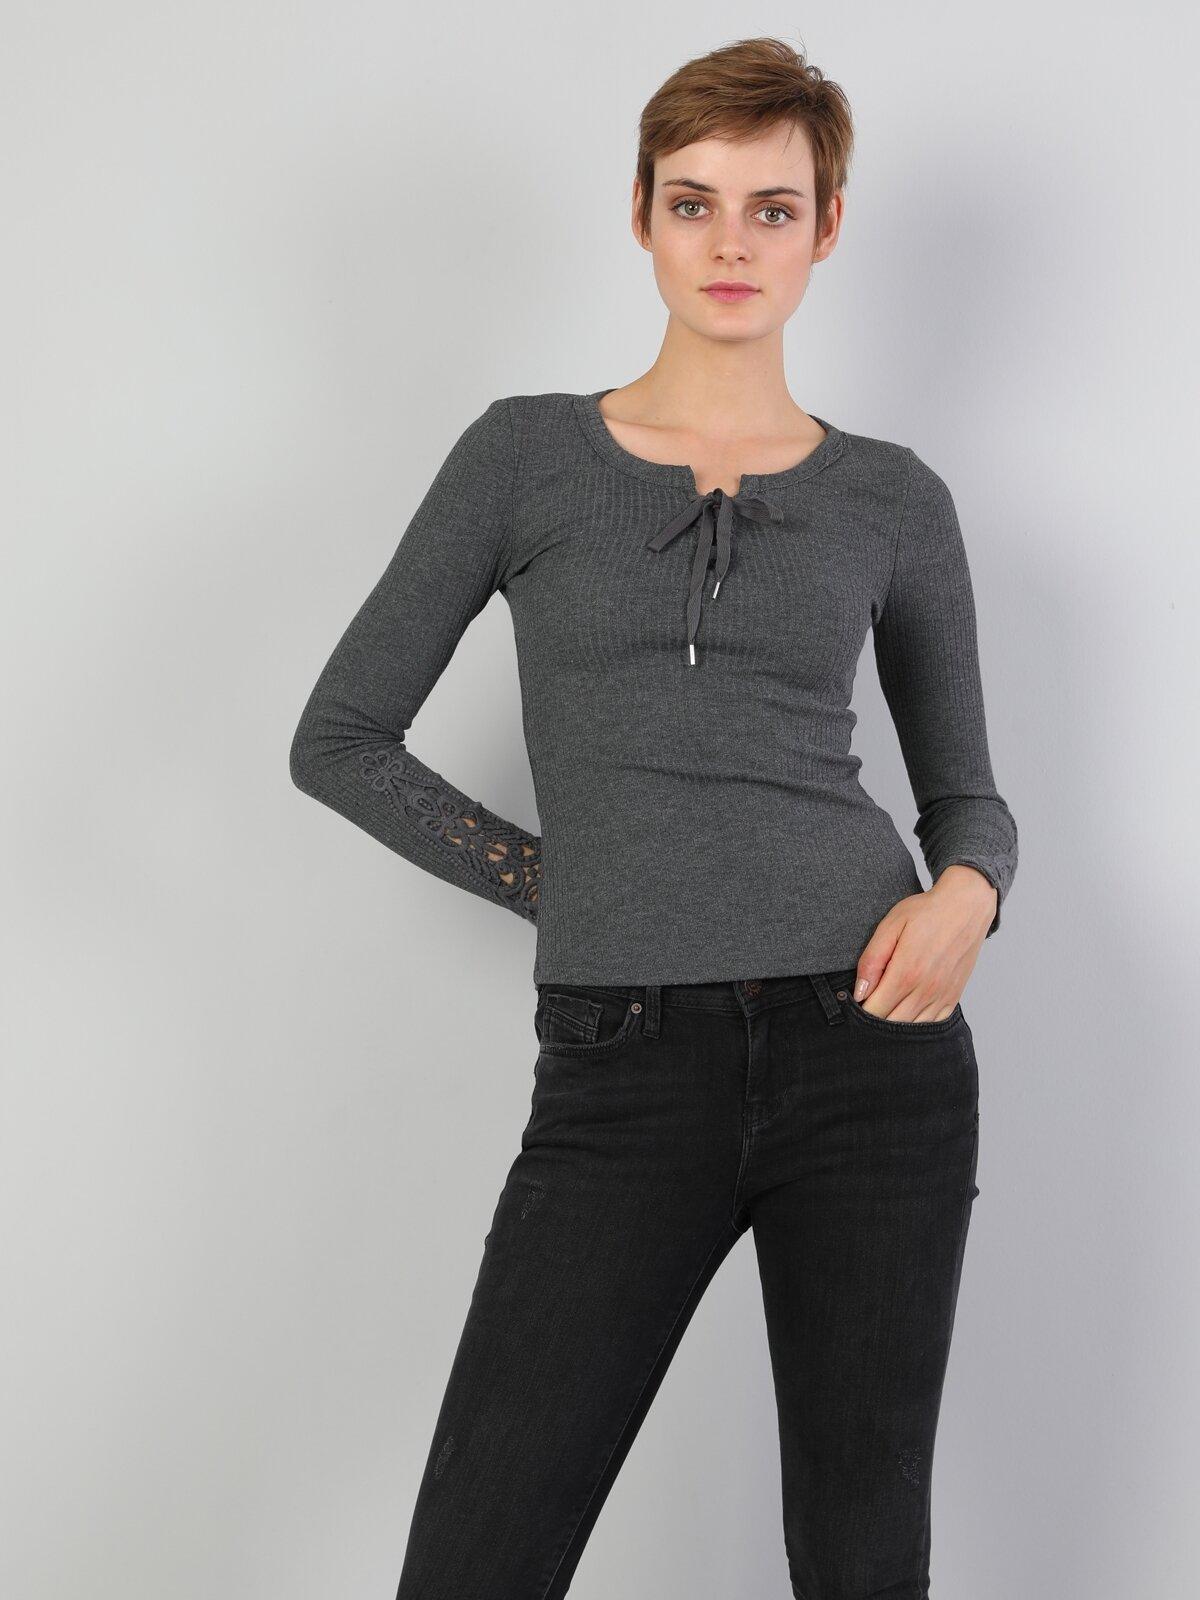 Slim Fit Derin Yuvarlak Yaka Kadın Antrasit Tshirt U.Kol